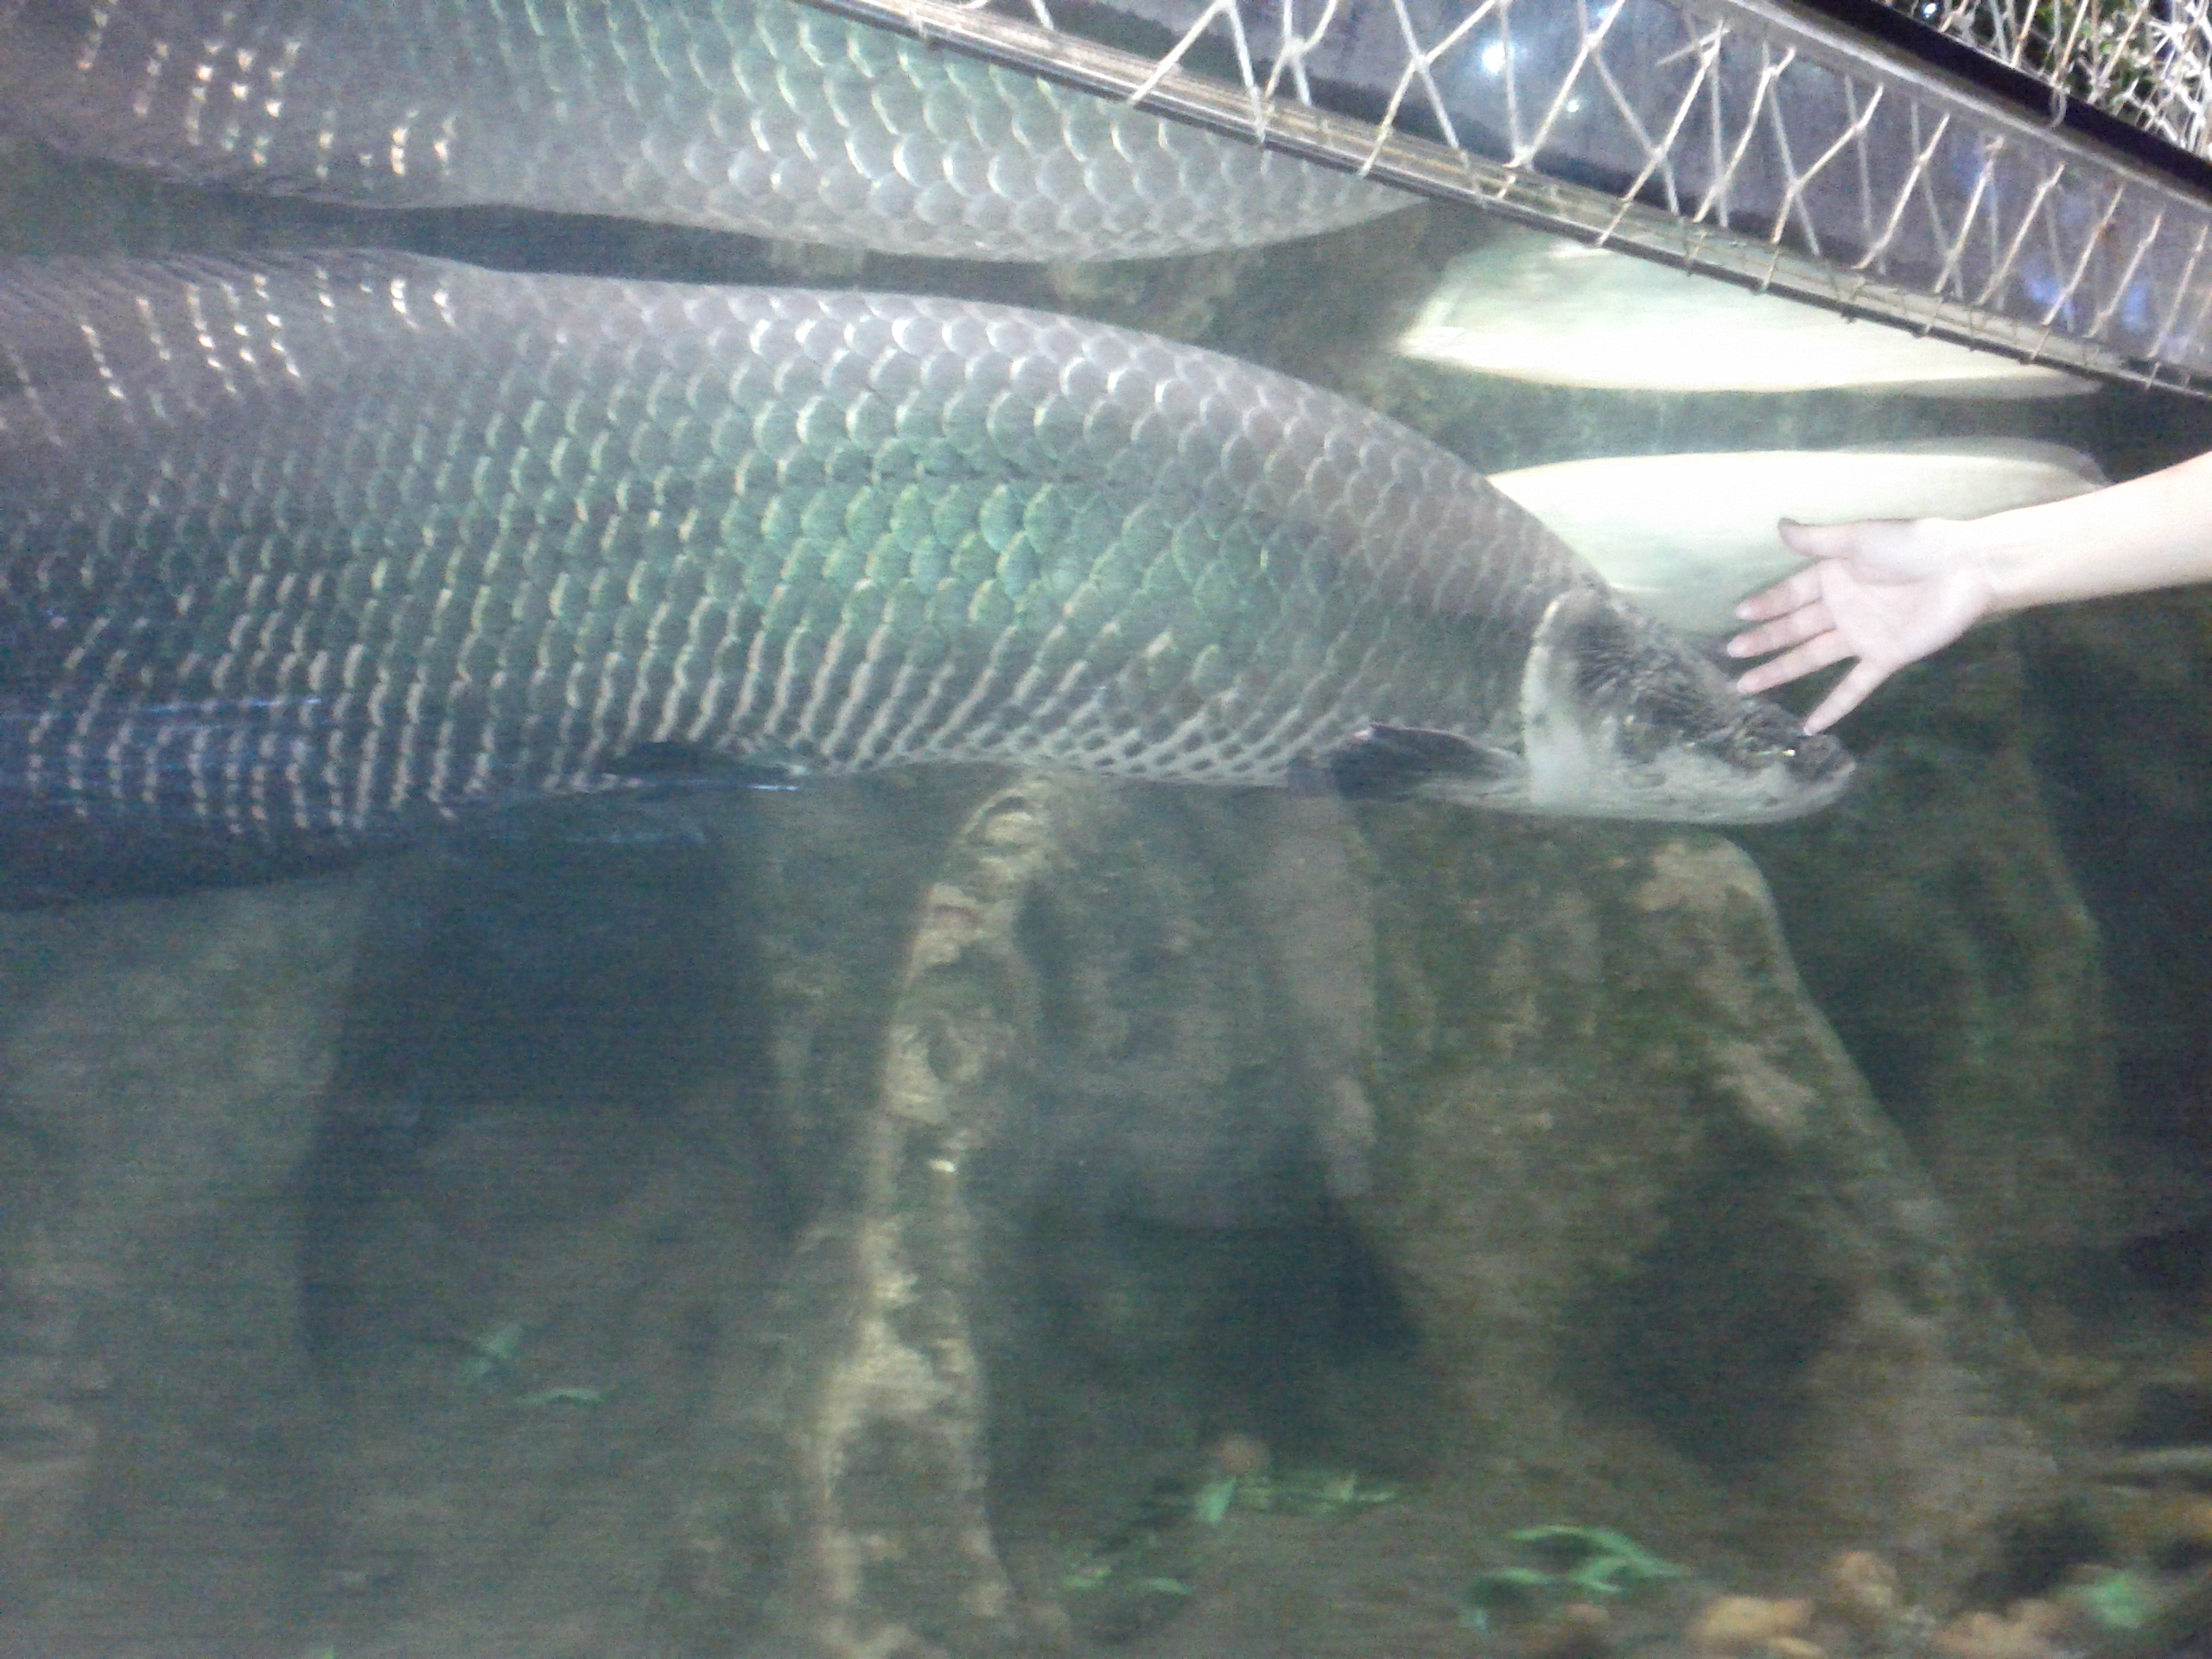 Large freshwater fish next to Yoyo's hand at Guangzhou zoo aquarium